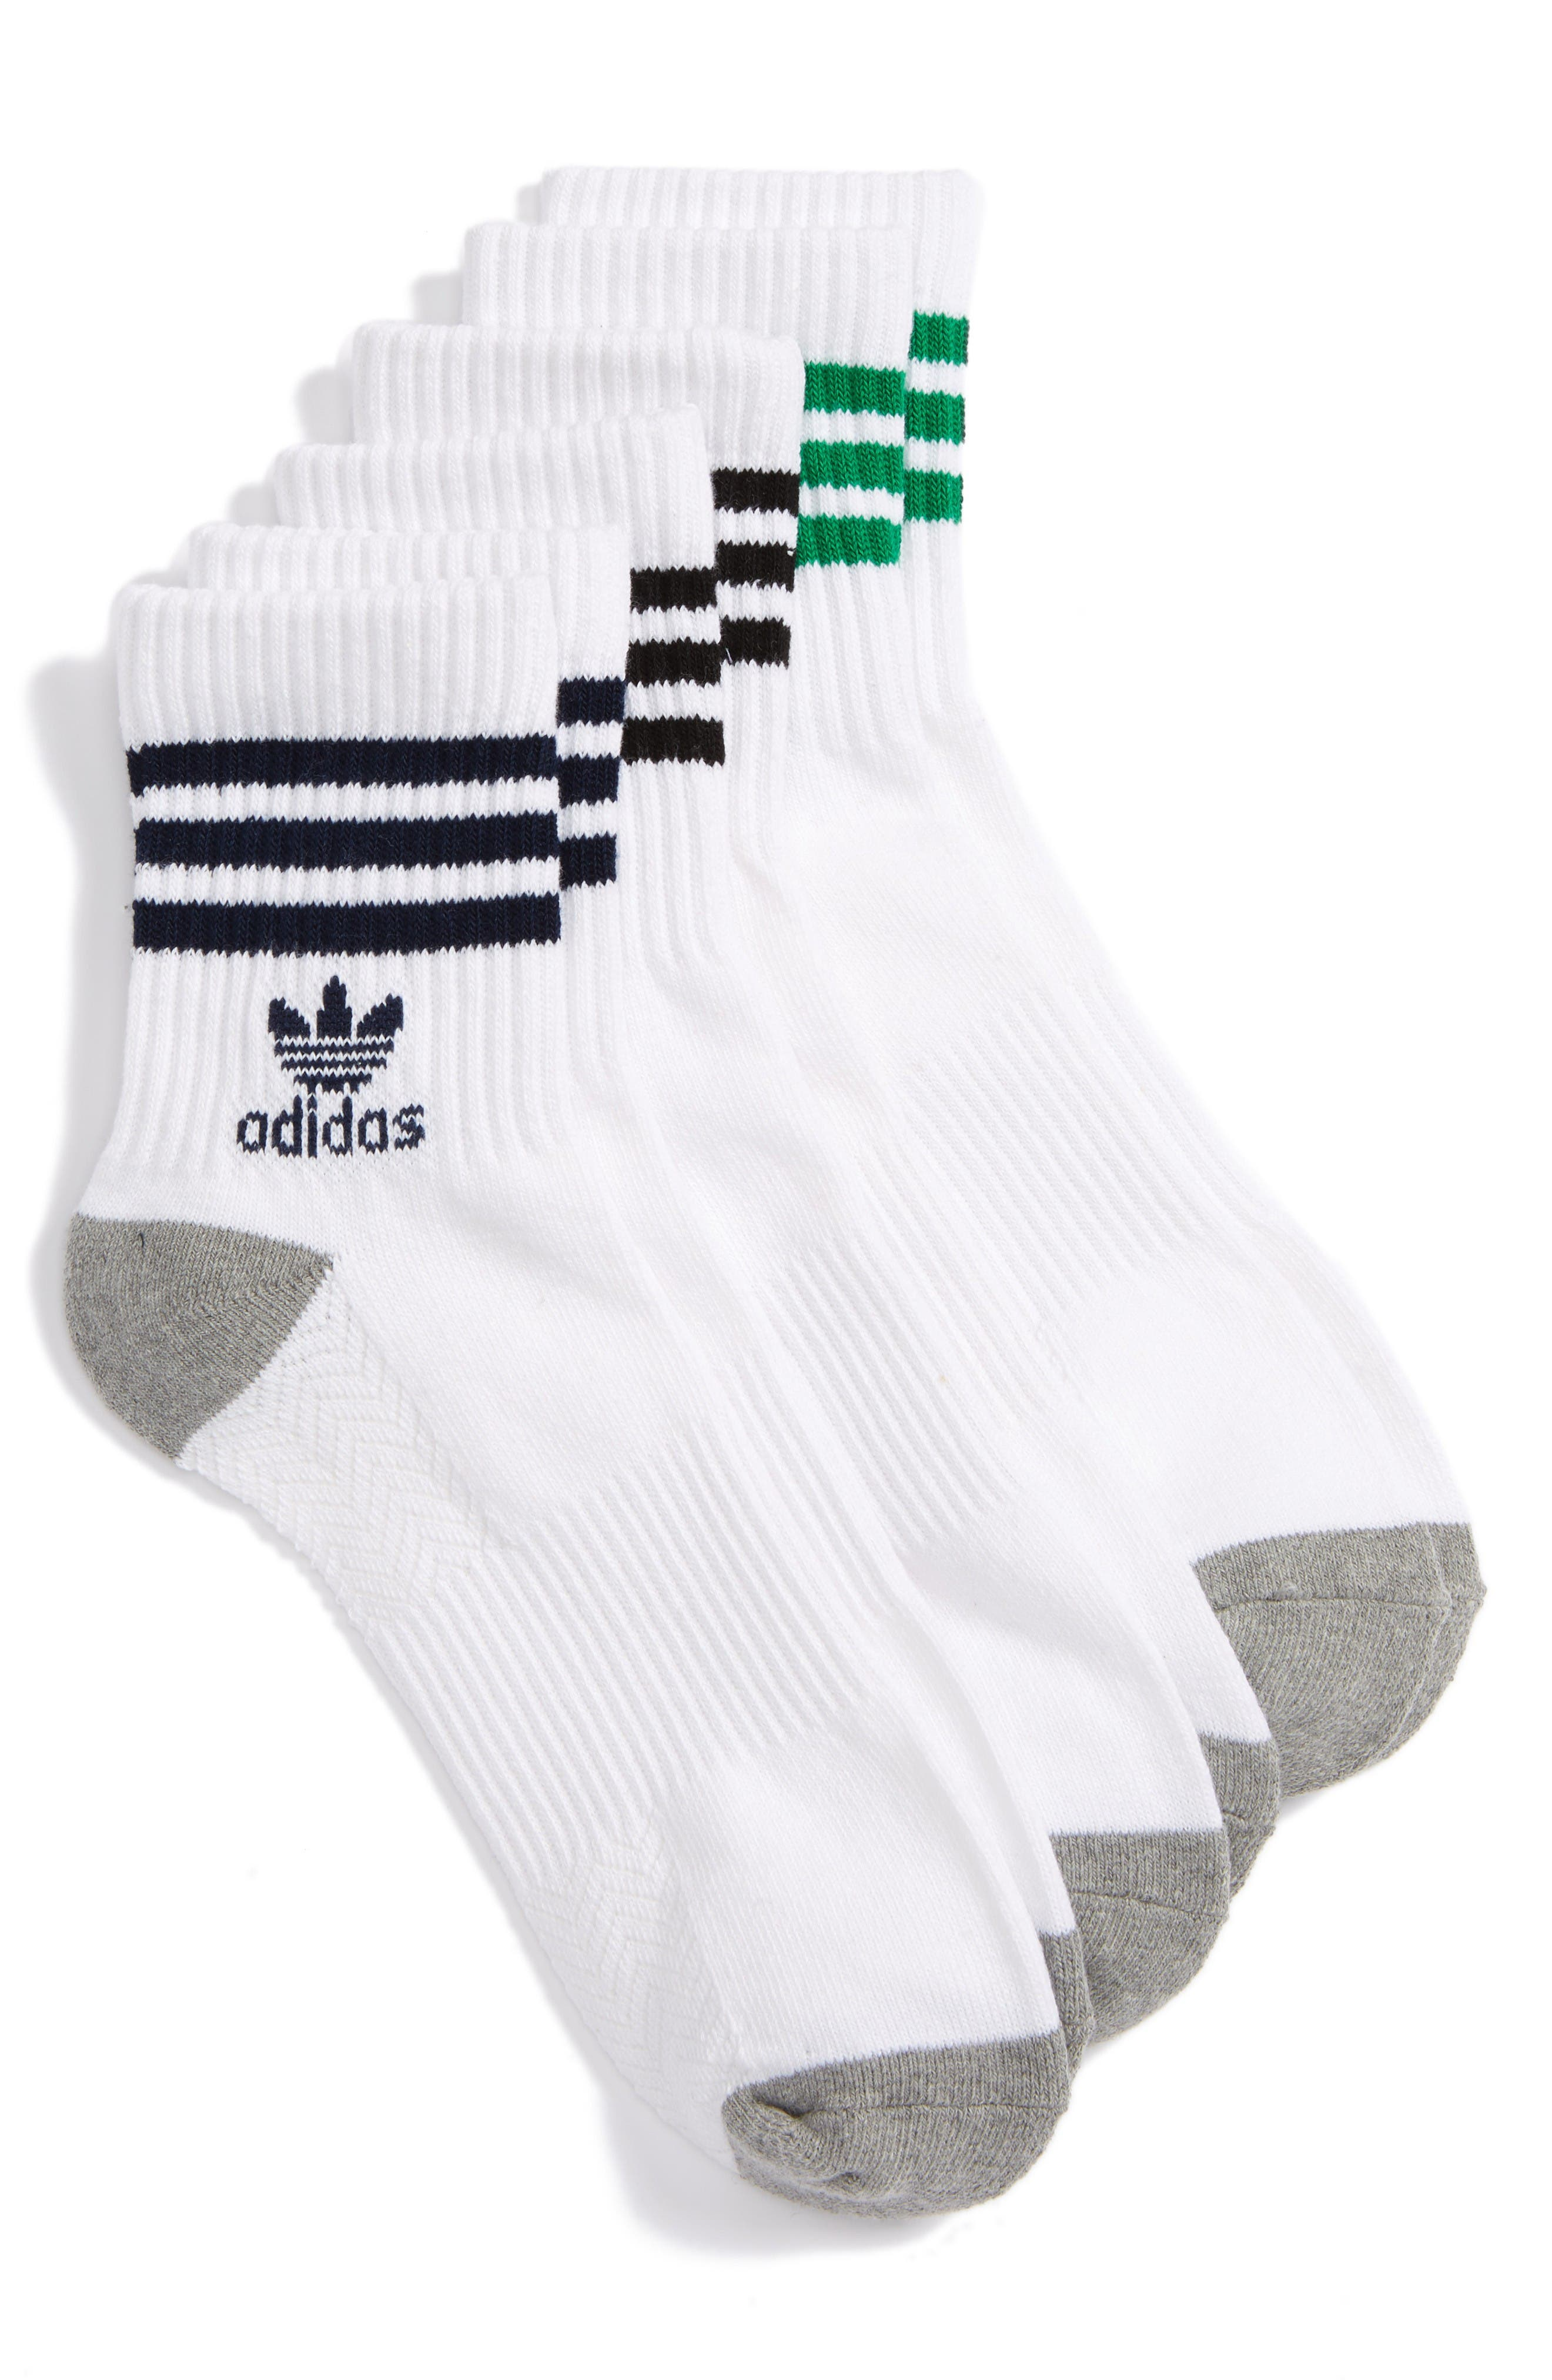 Alternate Image 1 Selected - adidas Originals 3-Pack Quarter Crew Socks